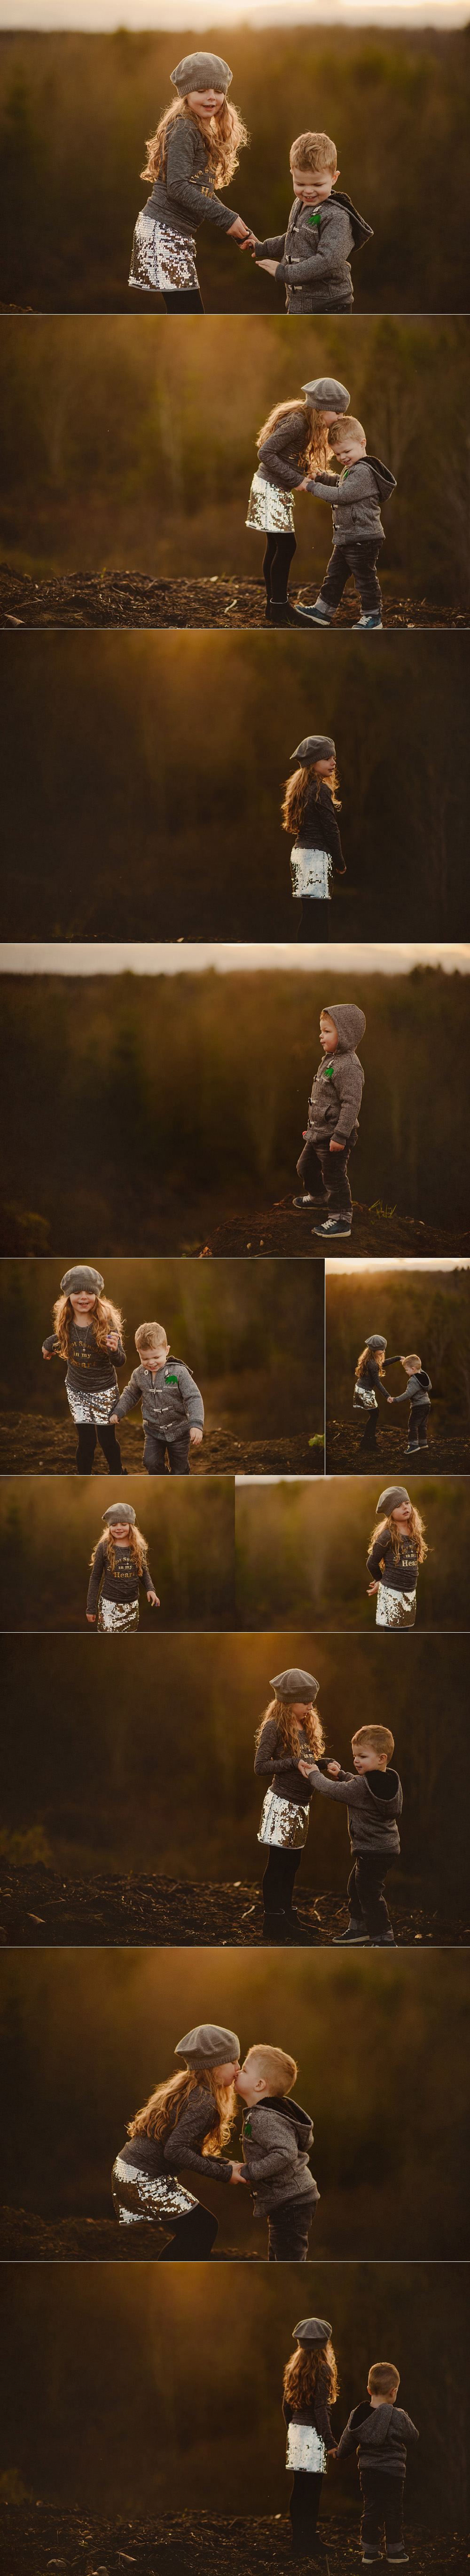 beautiful children, beautiful light